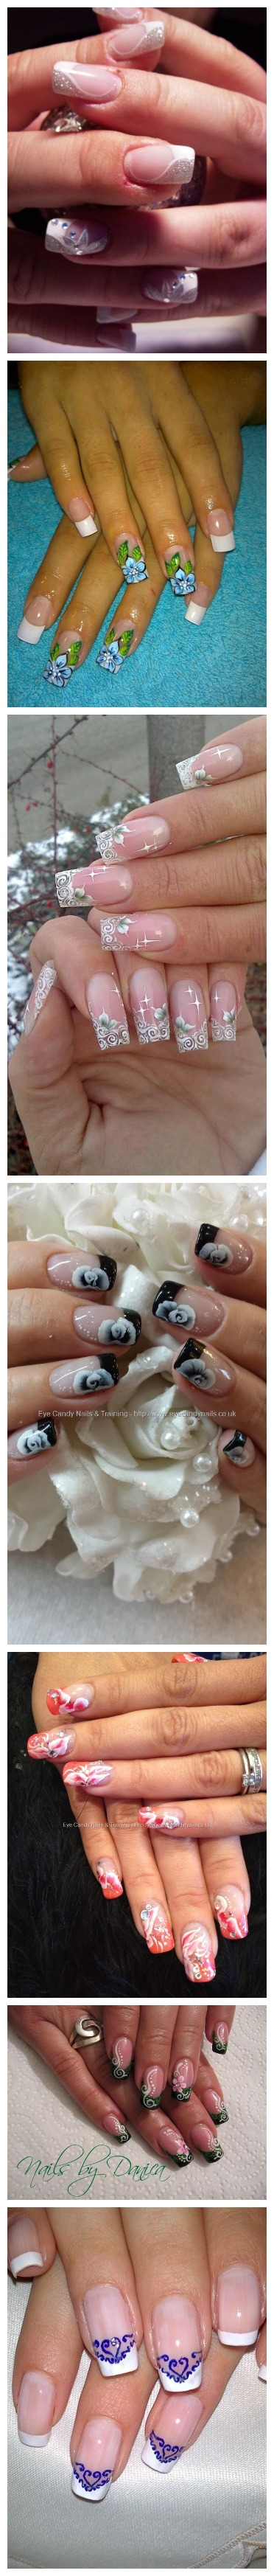 Choosing The Right Nail Art Tools For The Diy Person Schweet Nail